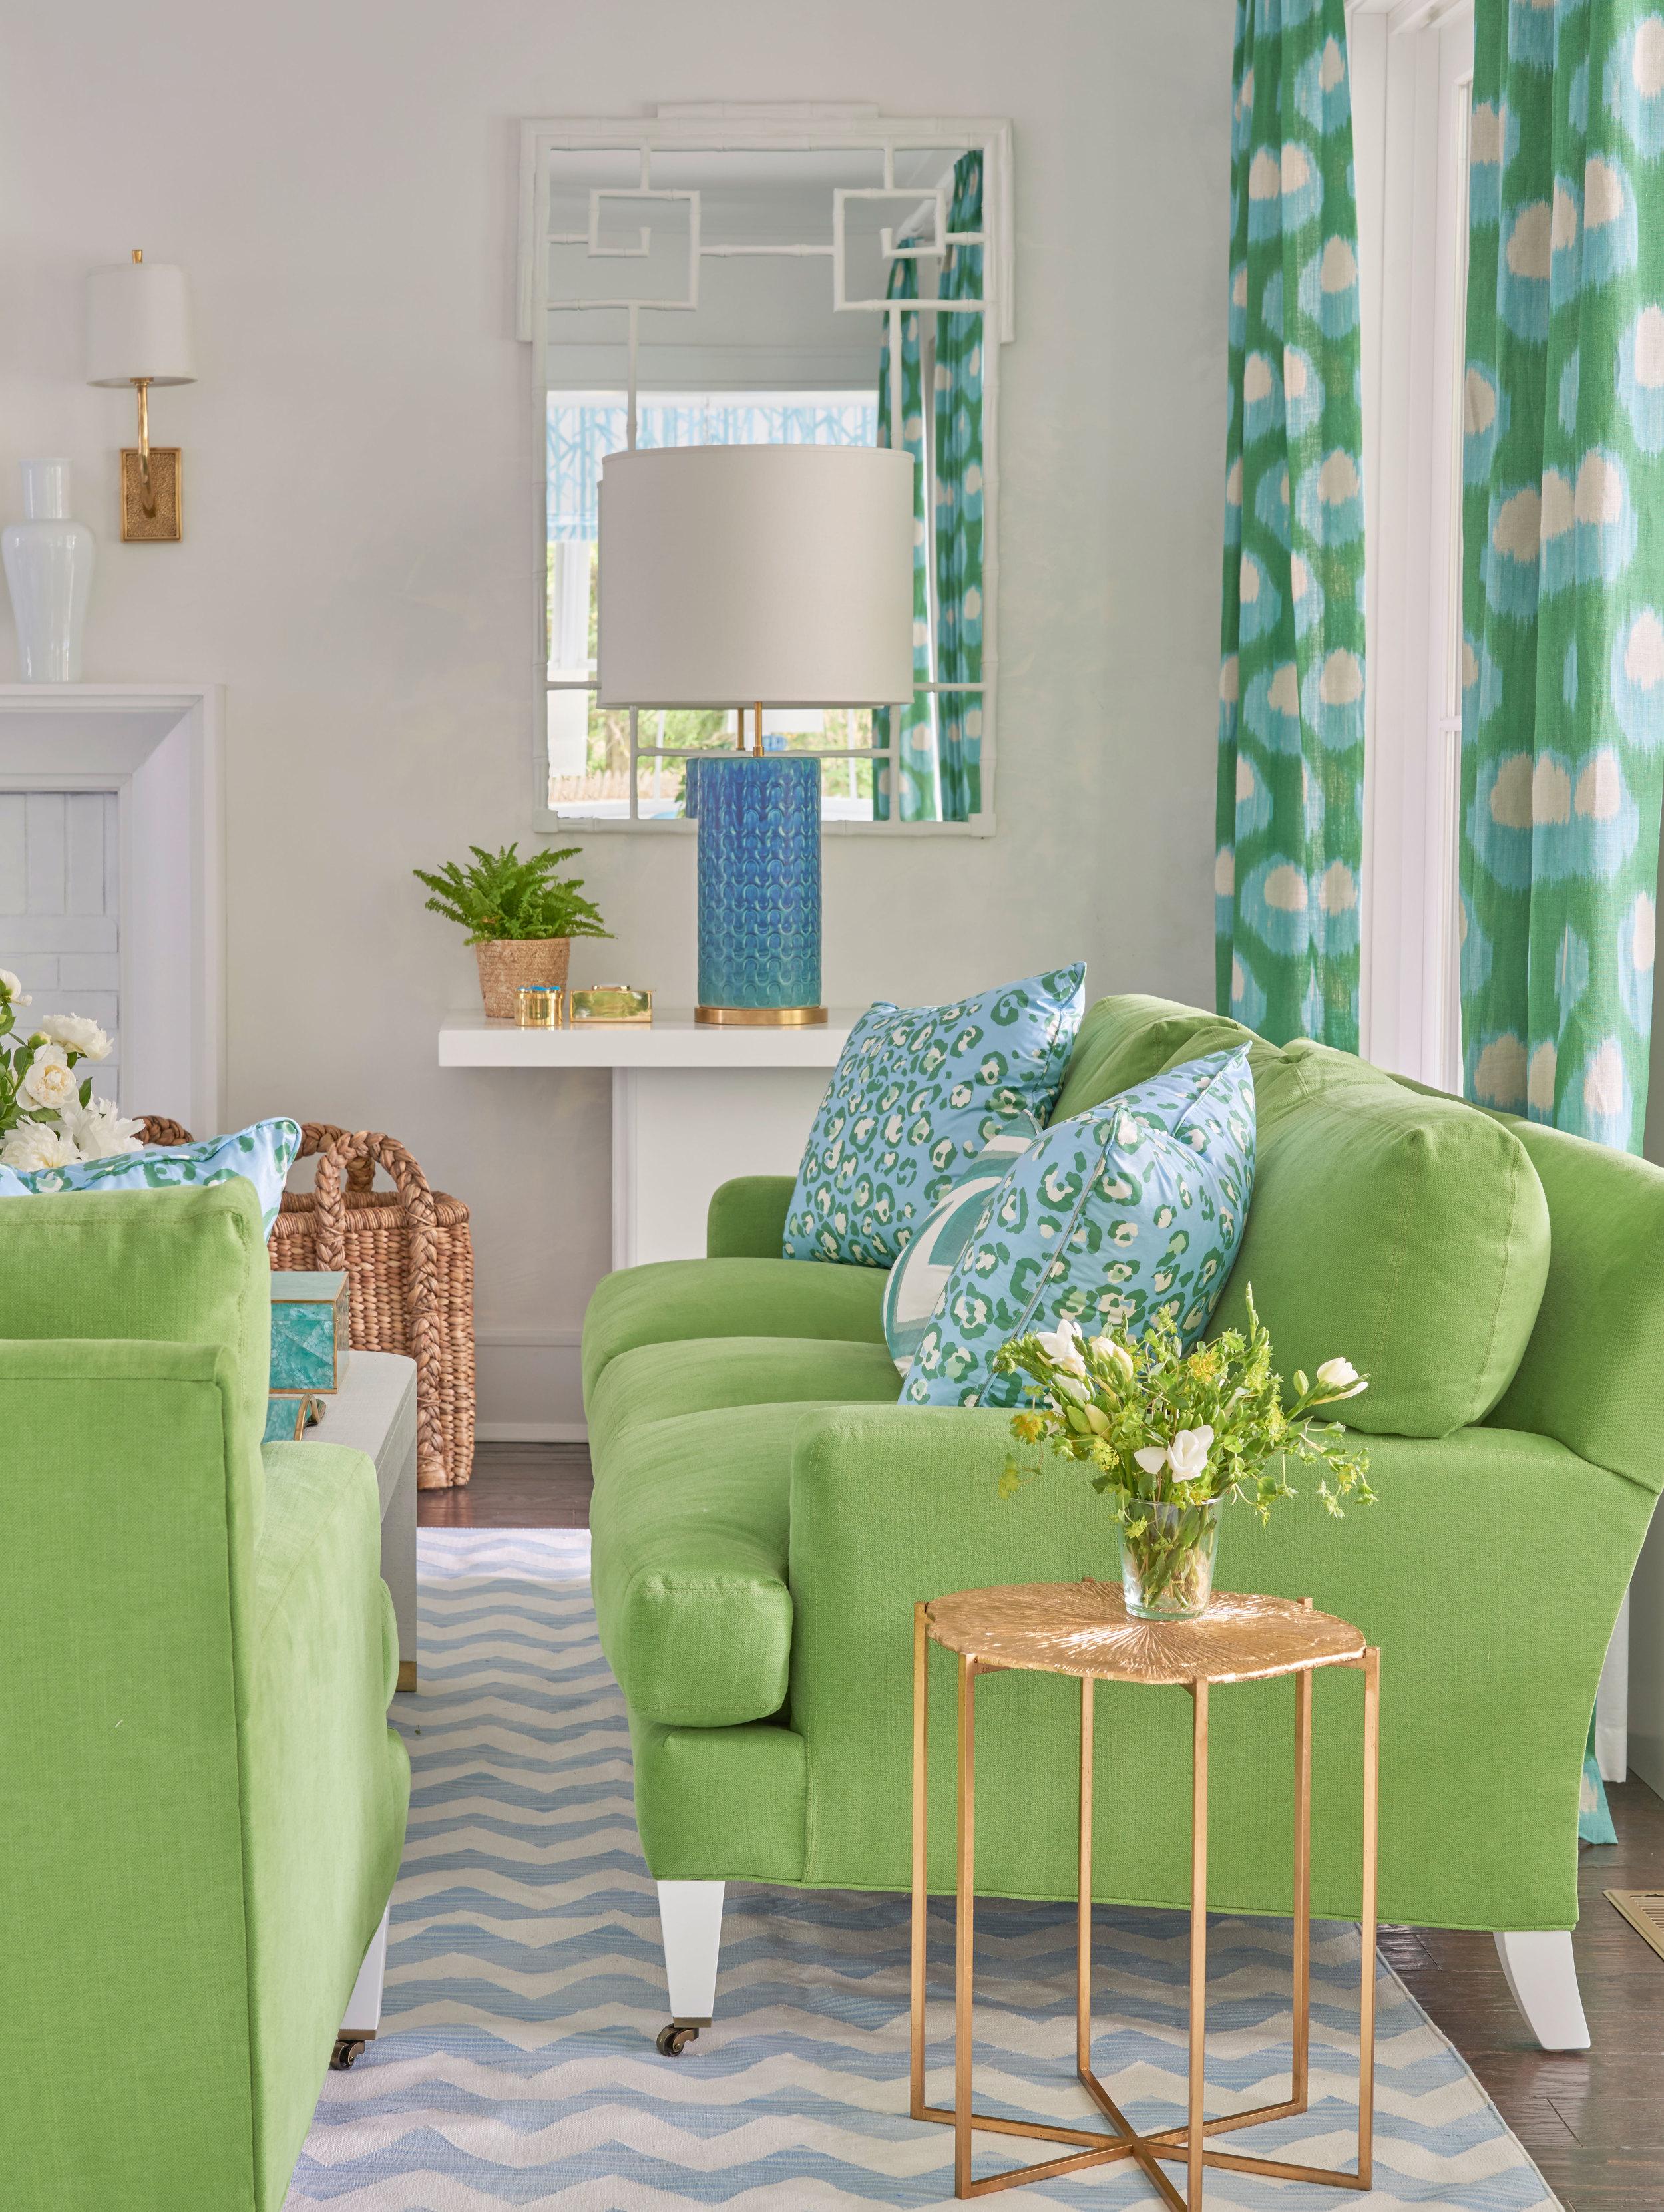 Meg-Braff---Coastal-Living-Coastal-Idea-House-Living-room-Green-Sofa.jpg